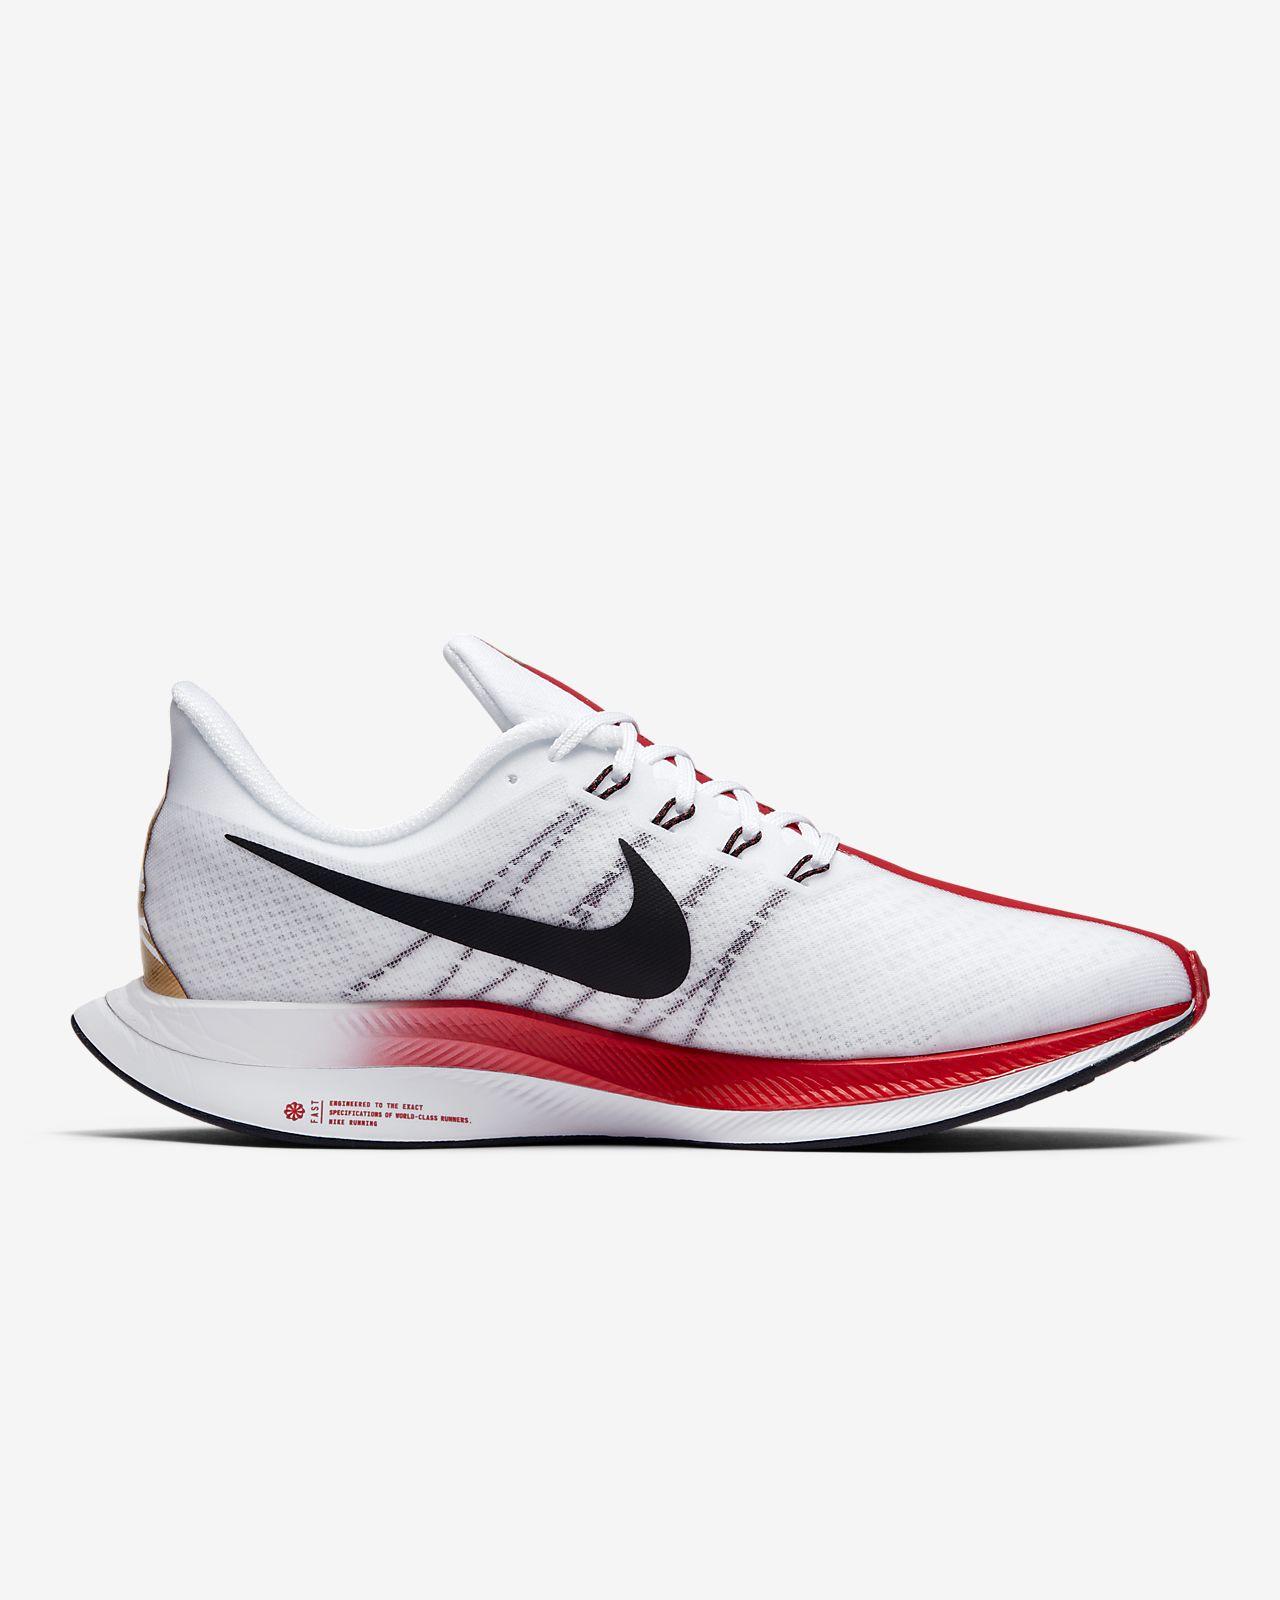 Nike Zoom Pegasus 35 Turbo Mo Farah Running Shoe. Nike.com CZ